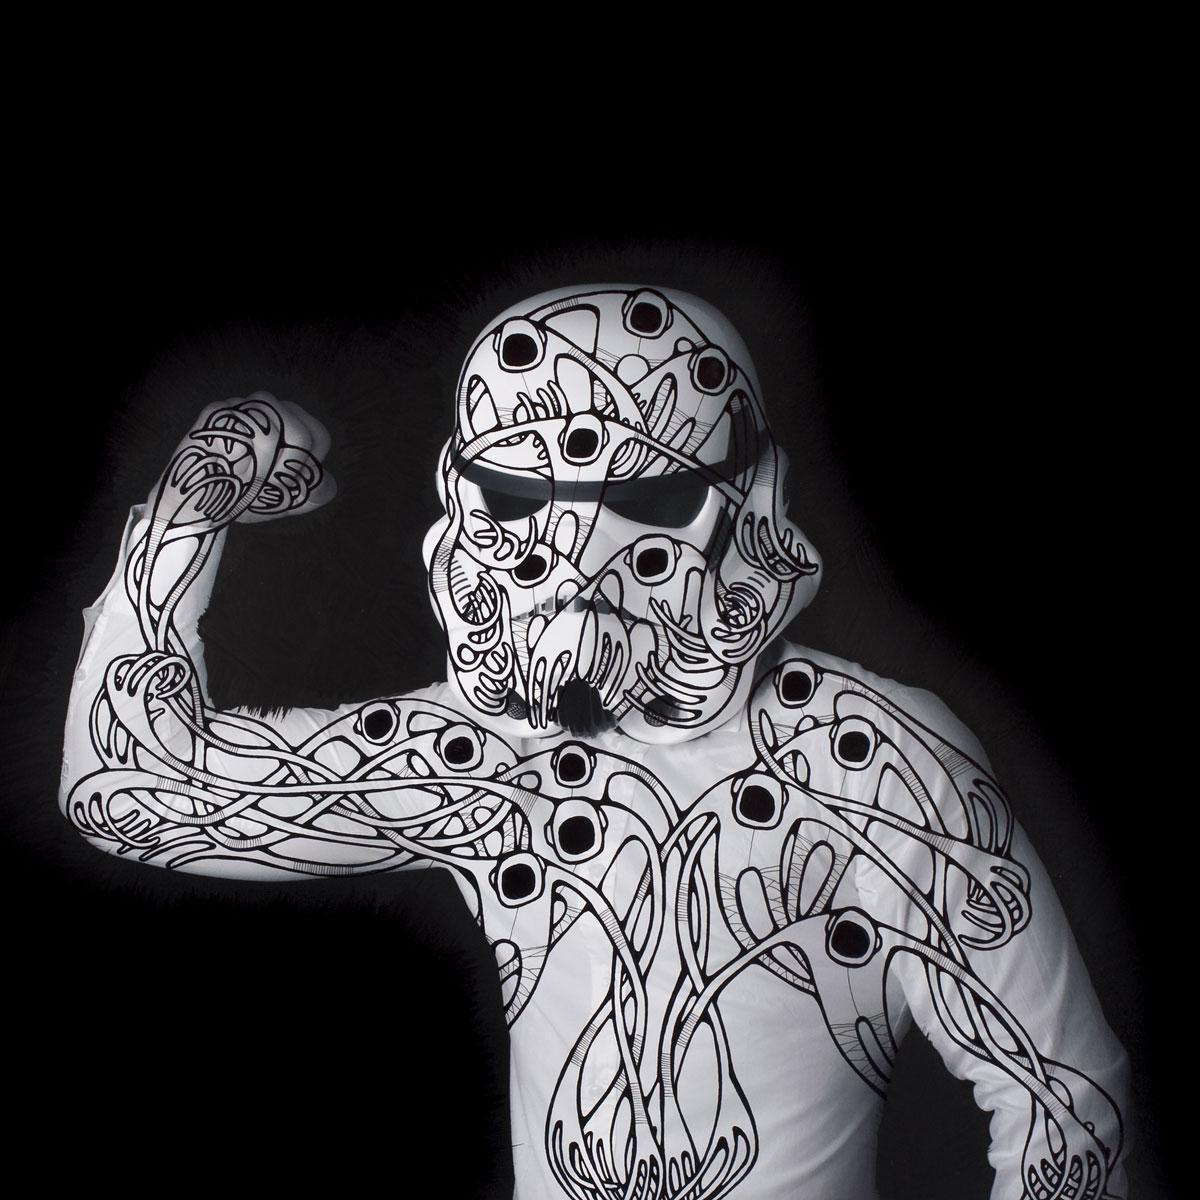 (Self portrait as a) Stormtrooper